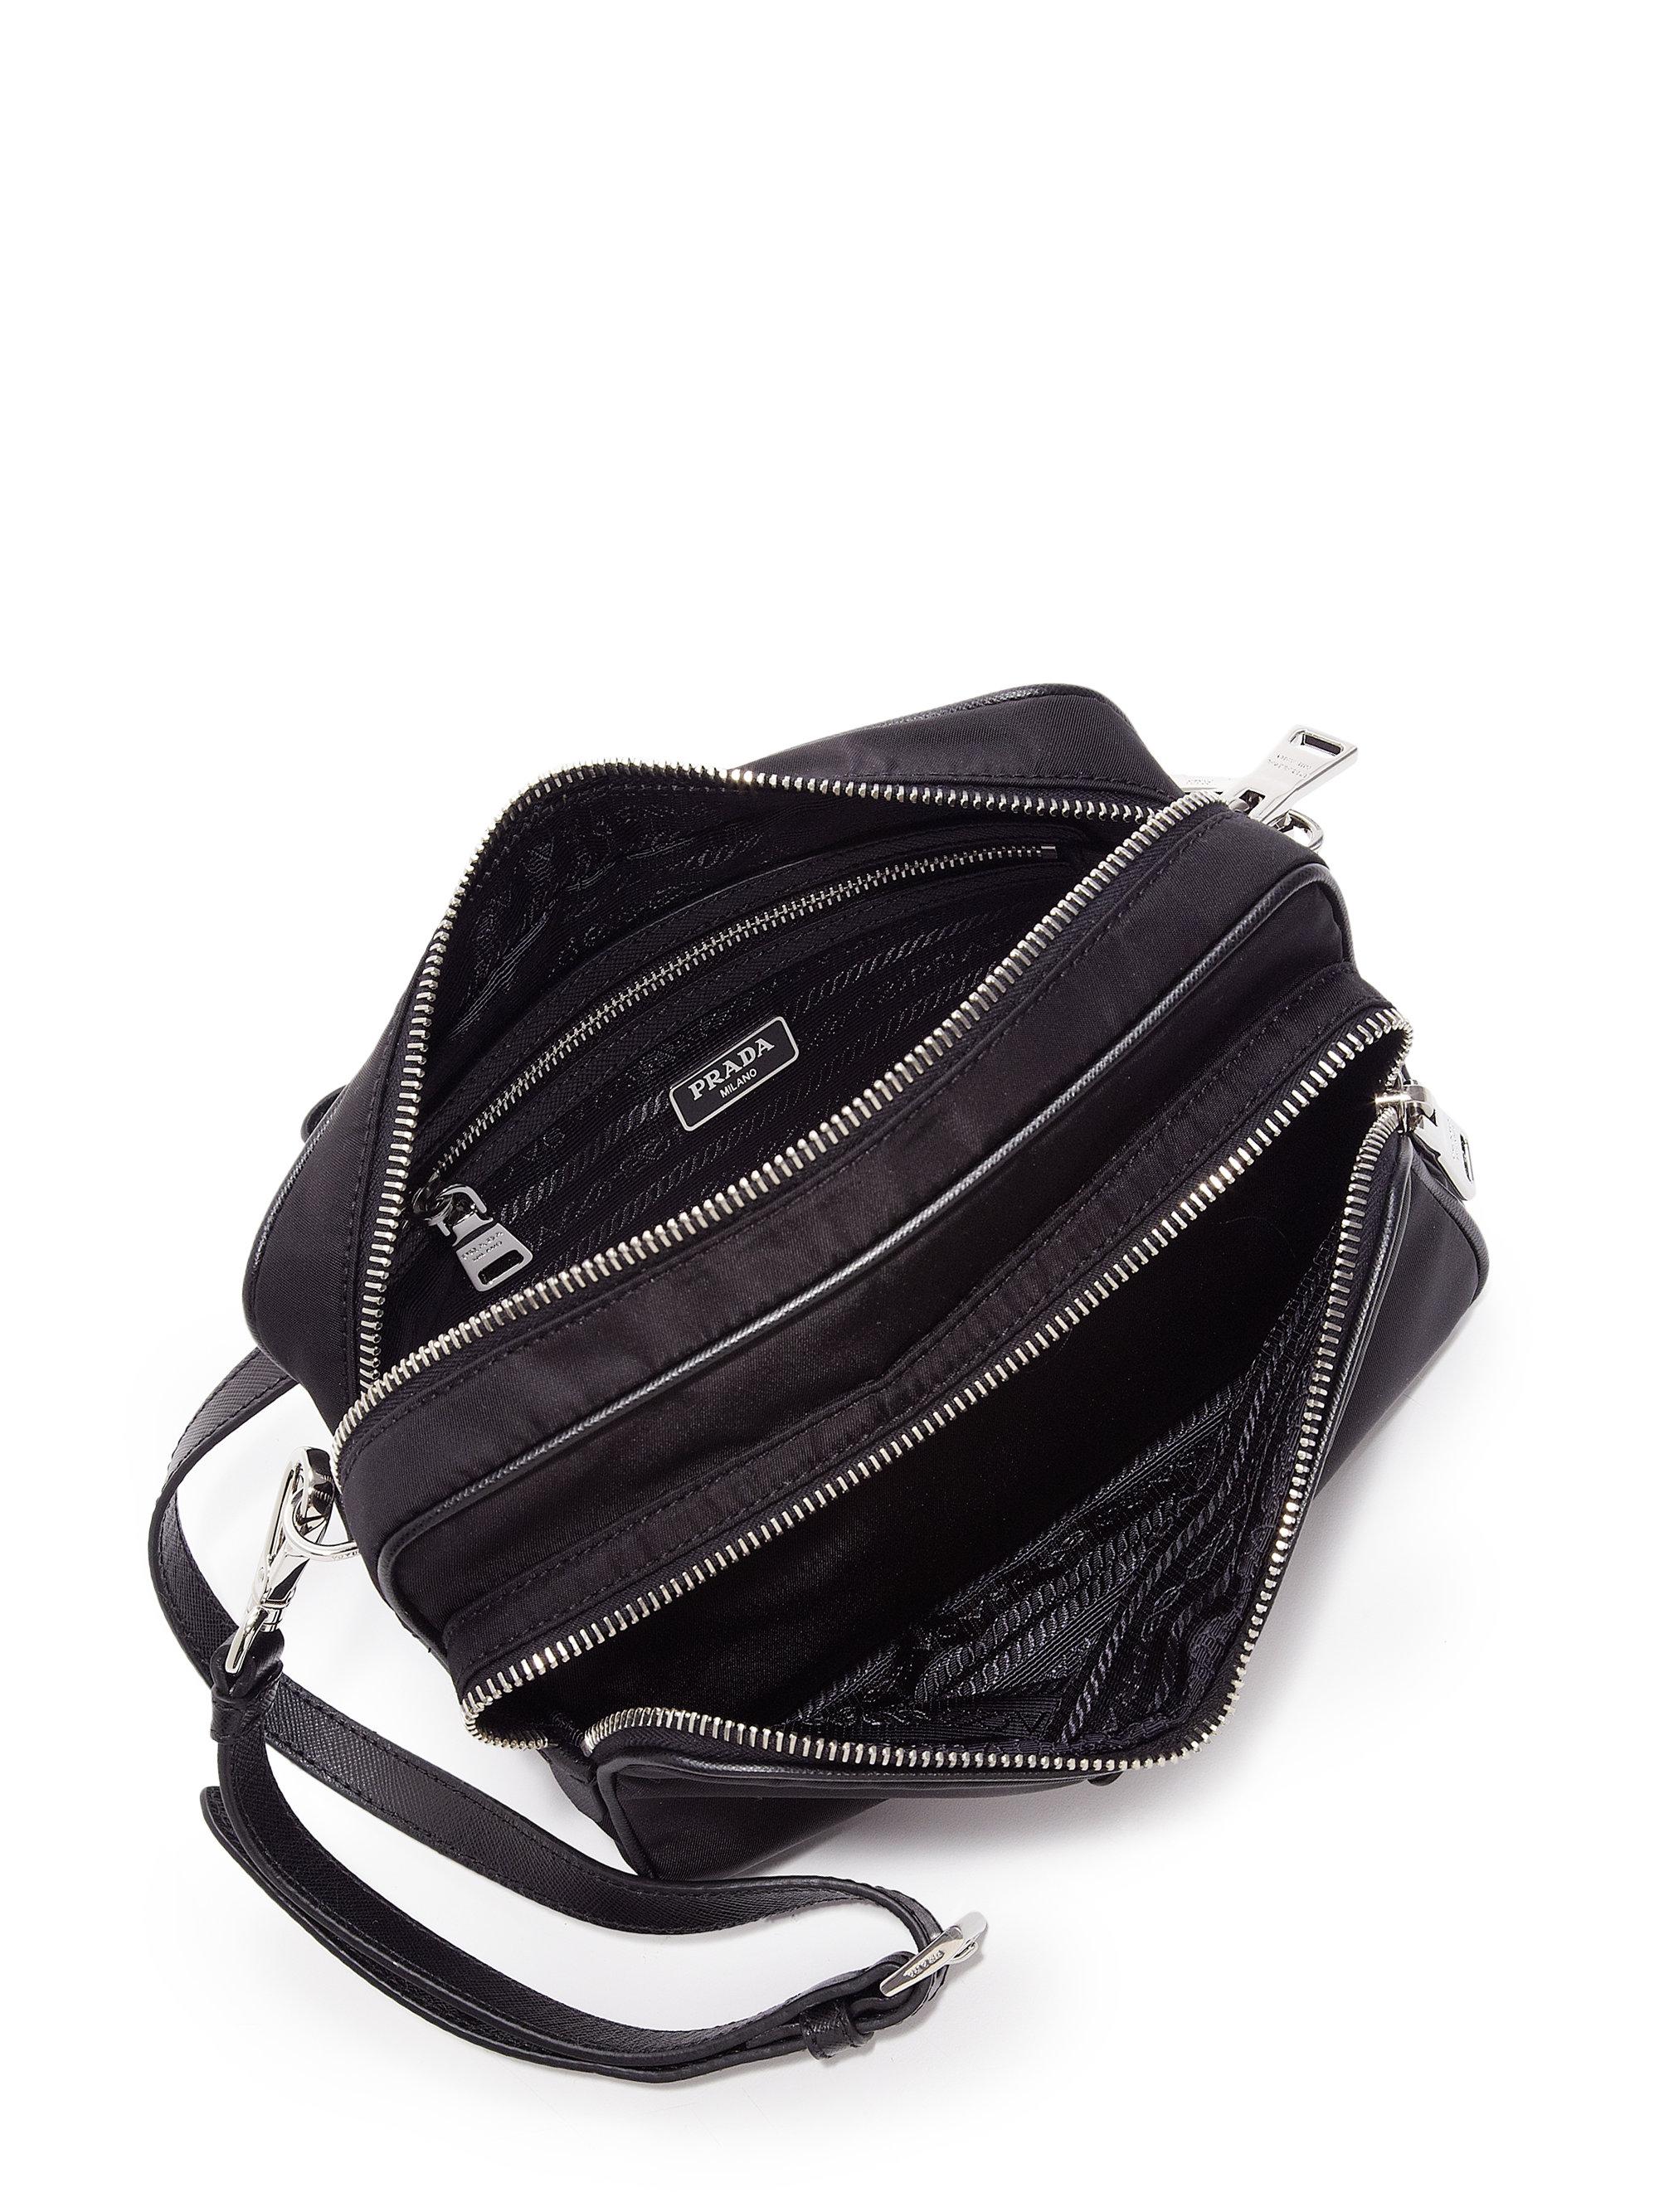 prada grey purse - Prada Nylon Double-zip Camera Bag in Black (NERO-BLACK) | Lyst